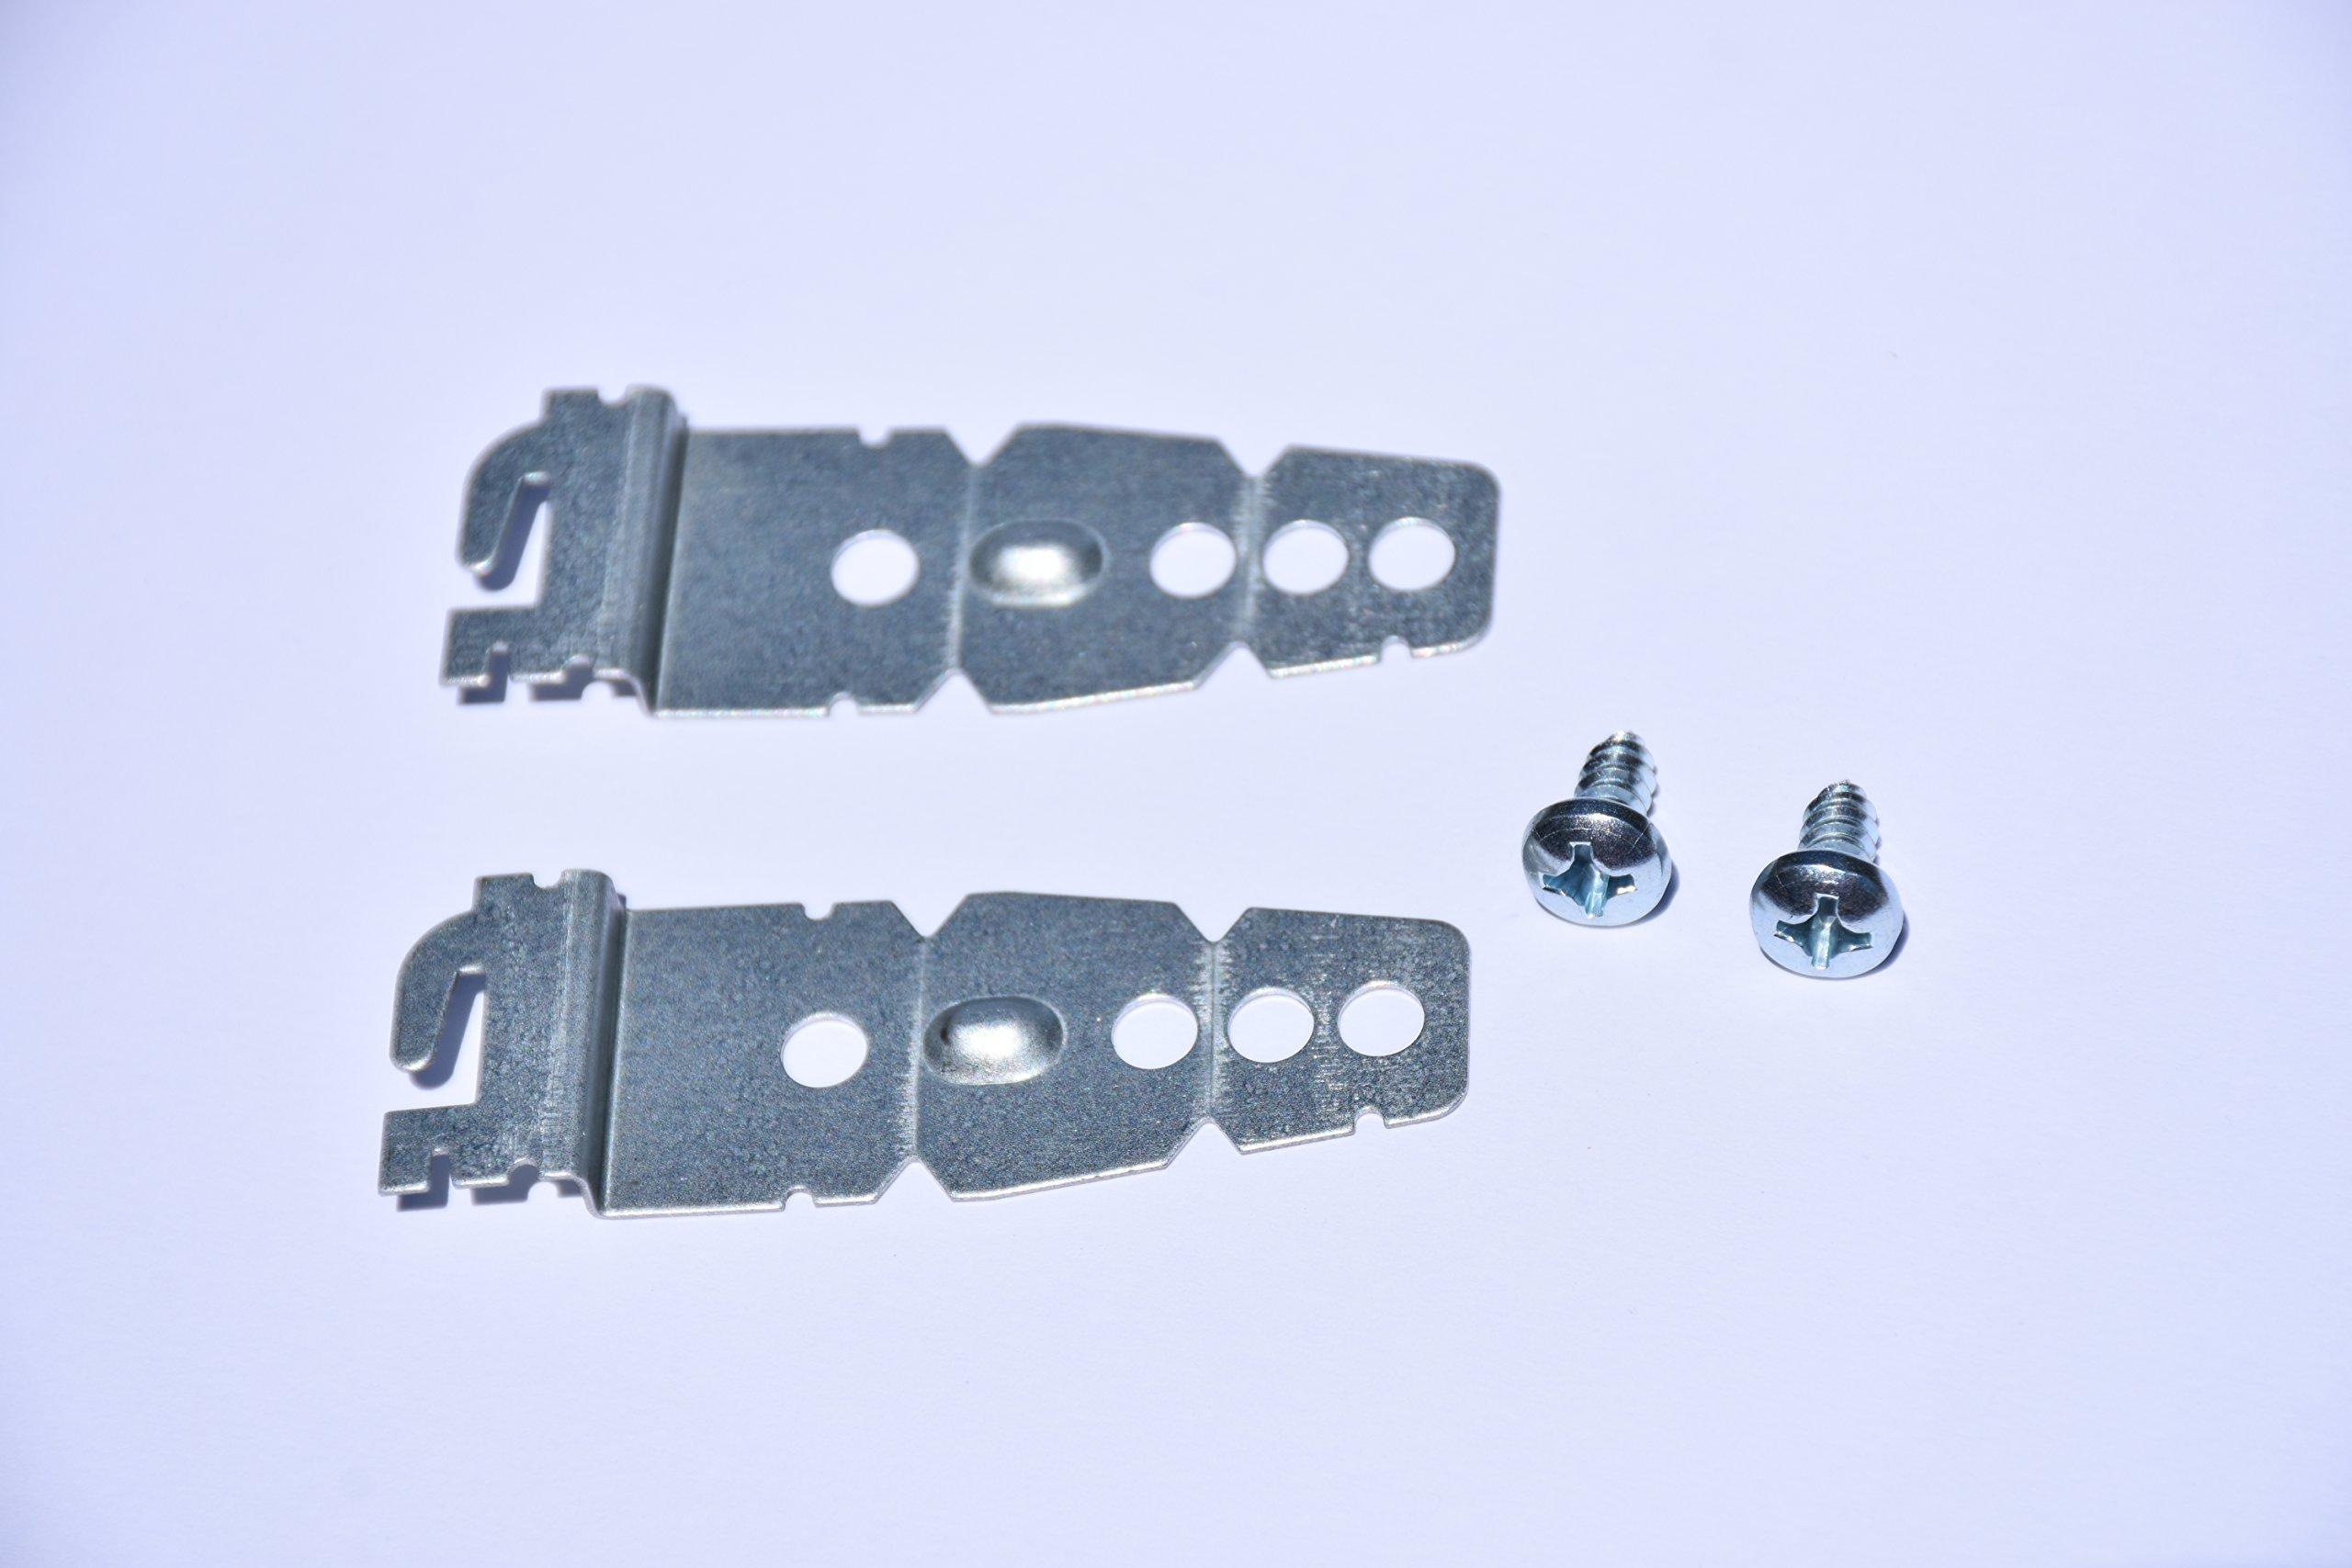 2-Pack Dishwasher Mounting Bracket w/screws | Universal Brackets for Kenmore Kitchenaid Frigidaire, Maytag, LG, Bosch Dishwashers | Under-Counter Mounting Bracket | Compare to parts 8269145/WP82691